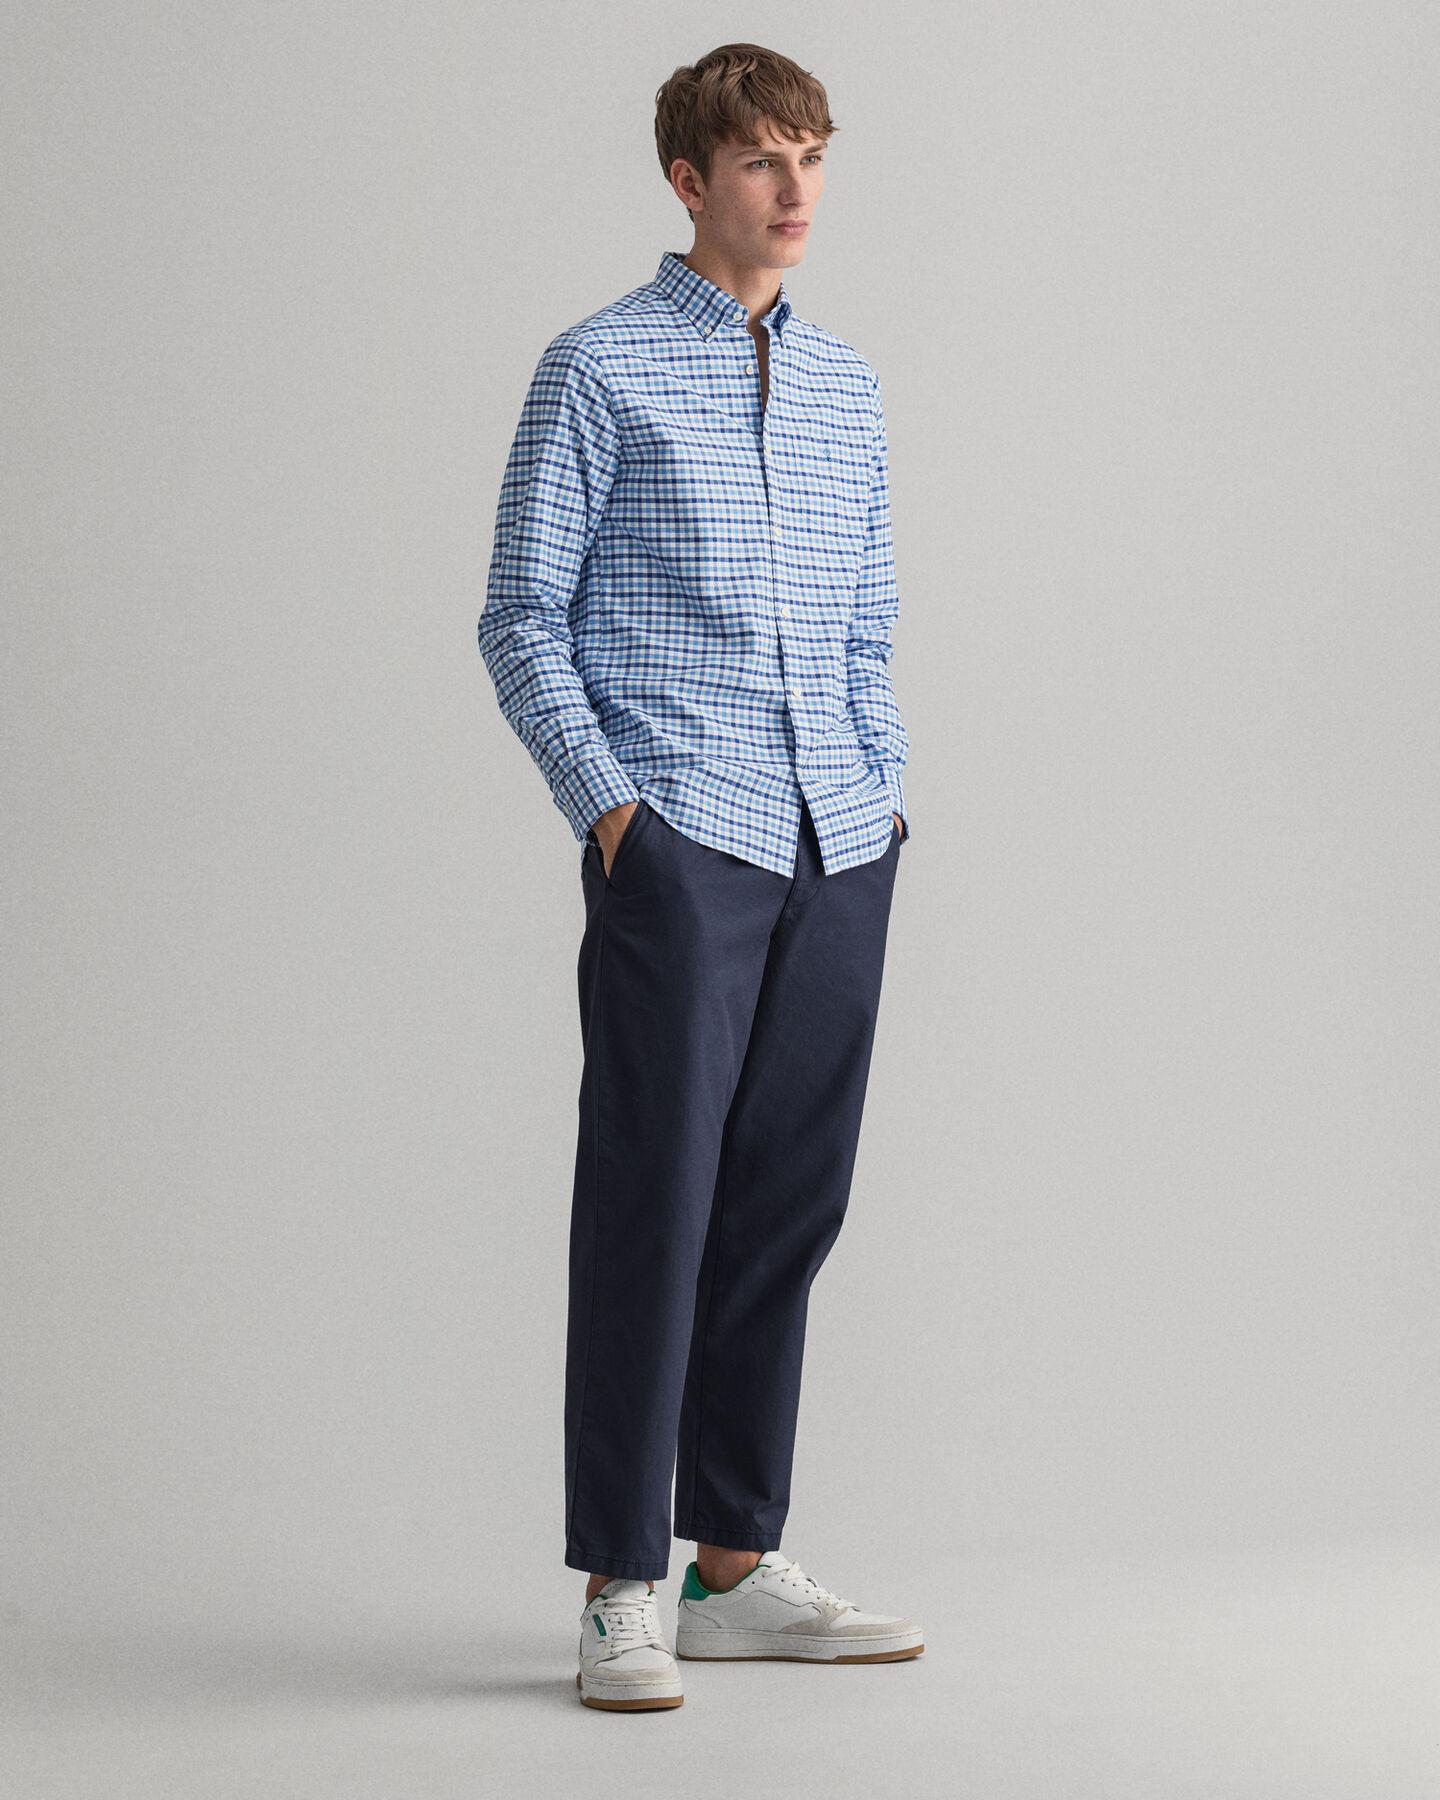 Regular Fit Oxford-Hemd mit Vichy-Karo in 2Farben